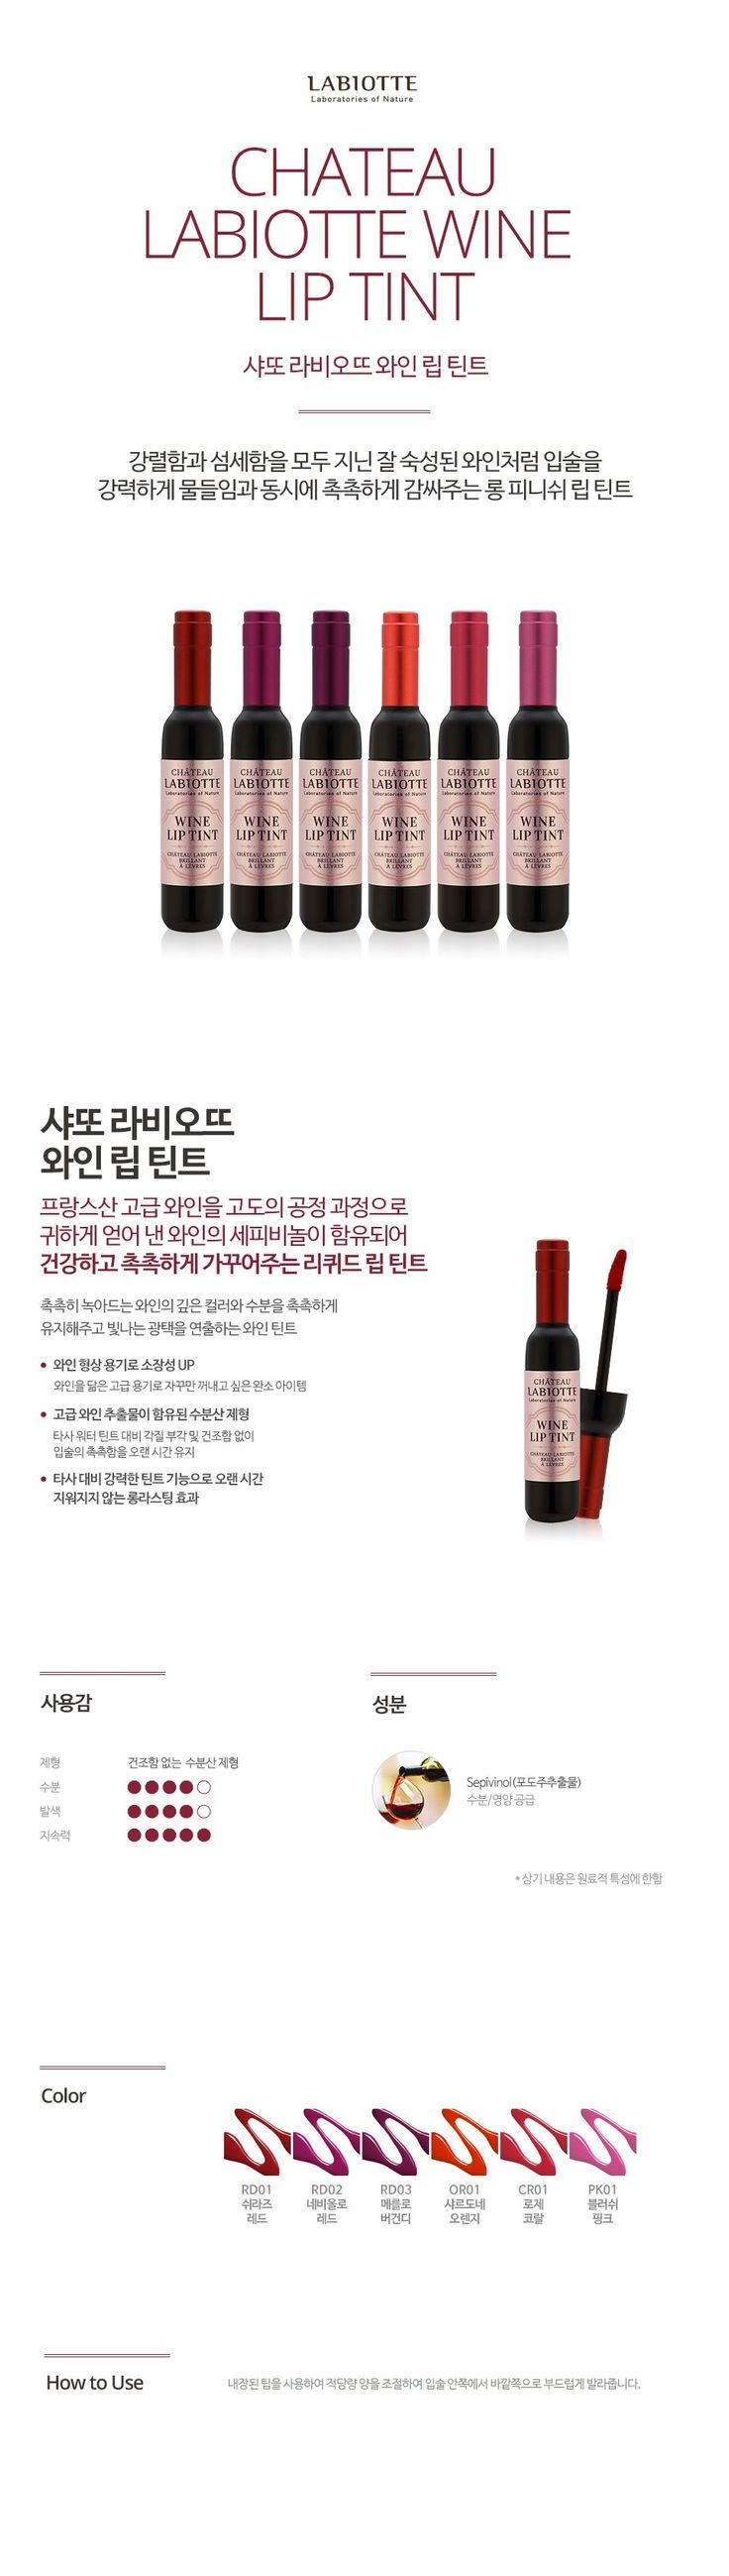 LABIOTTE CHATEAU LABIOTTE WINE LIP TINT / 紅酒造型染唇液 TWD330